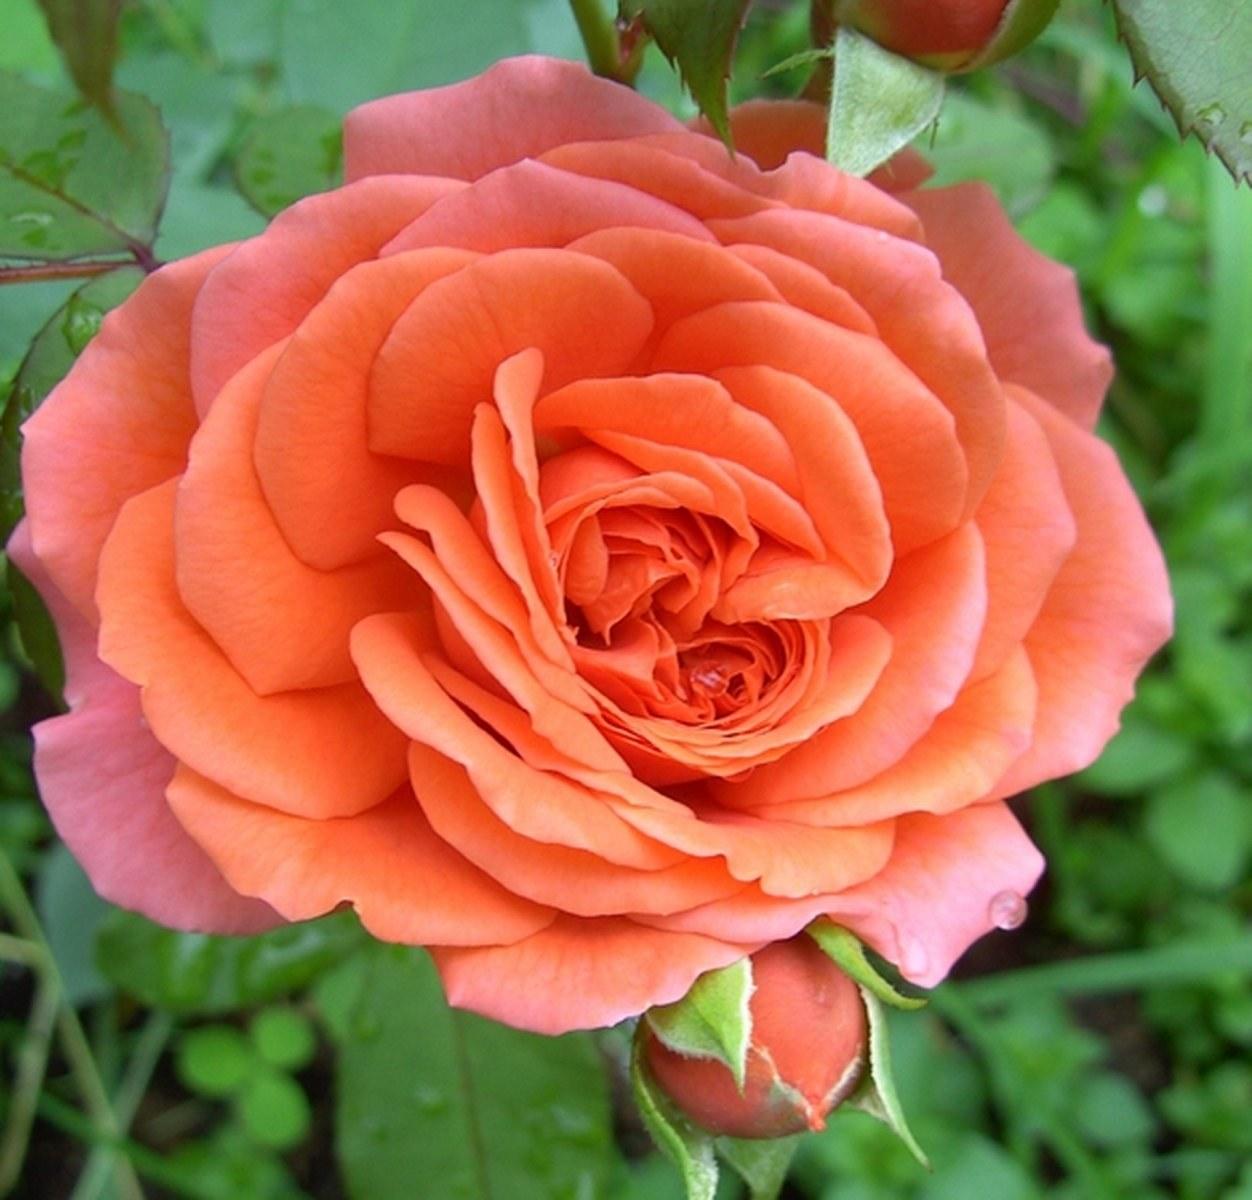 роза быстрым рисунком